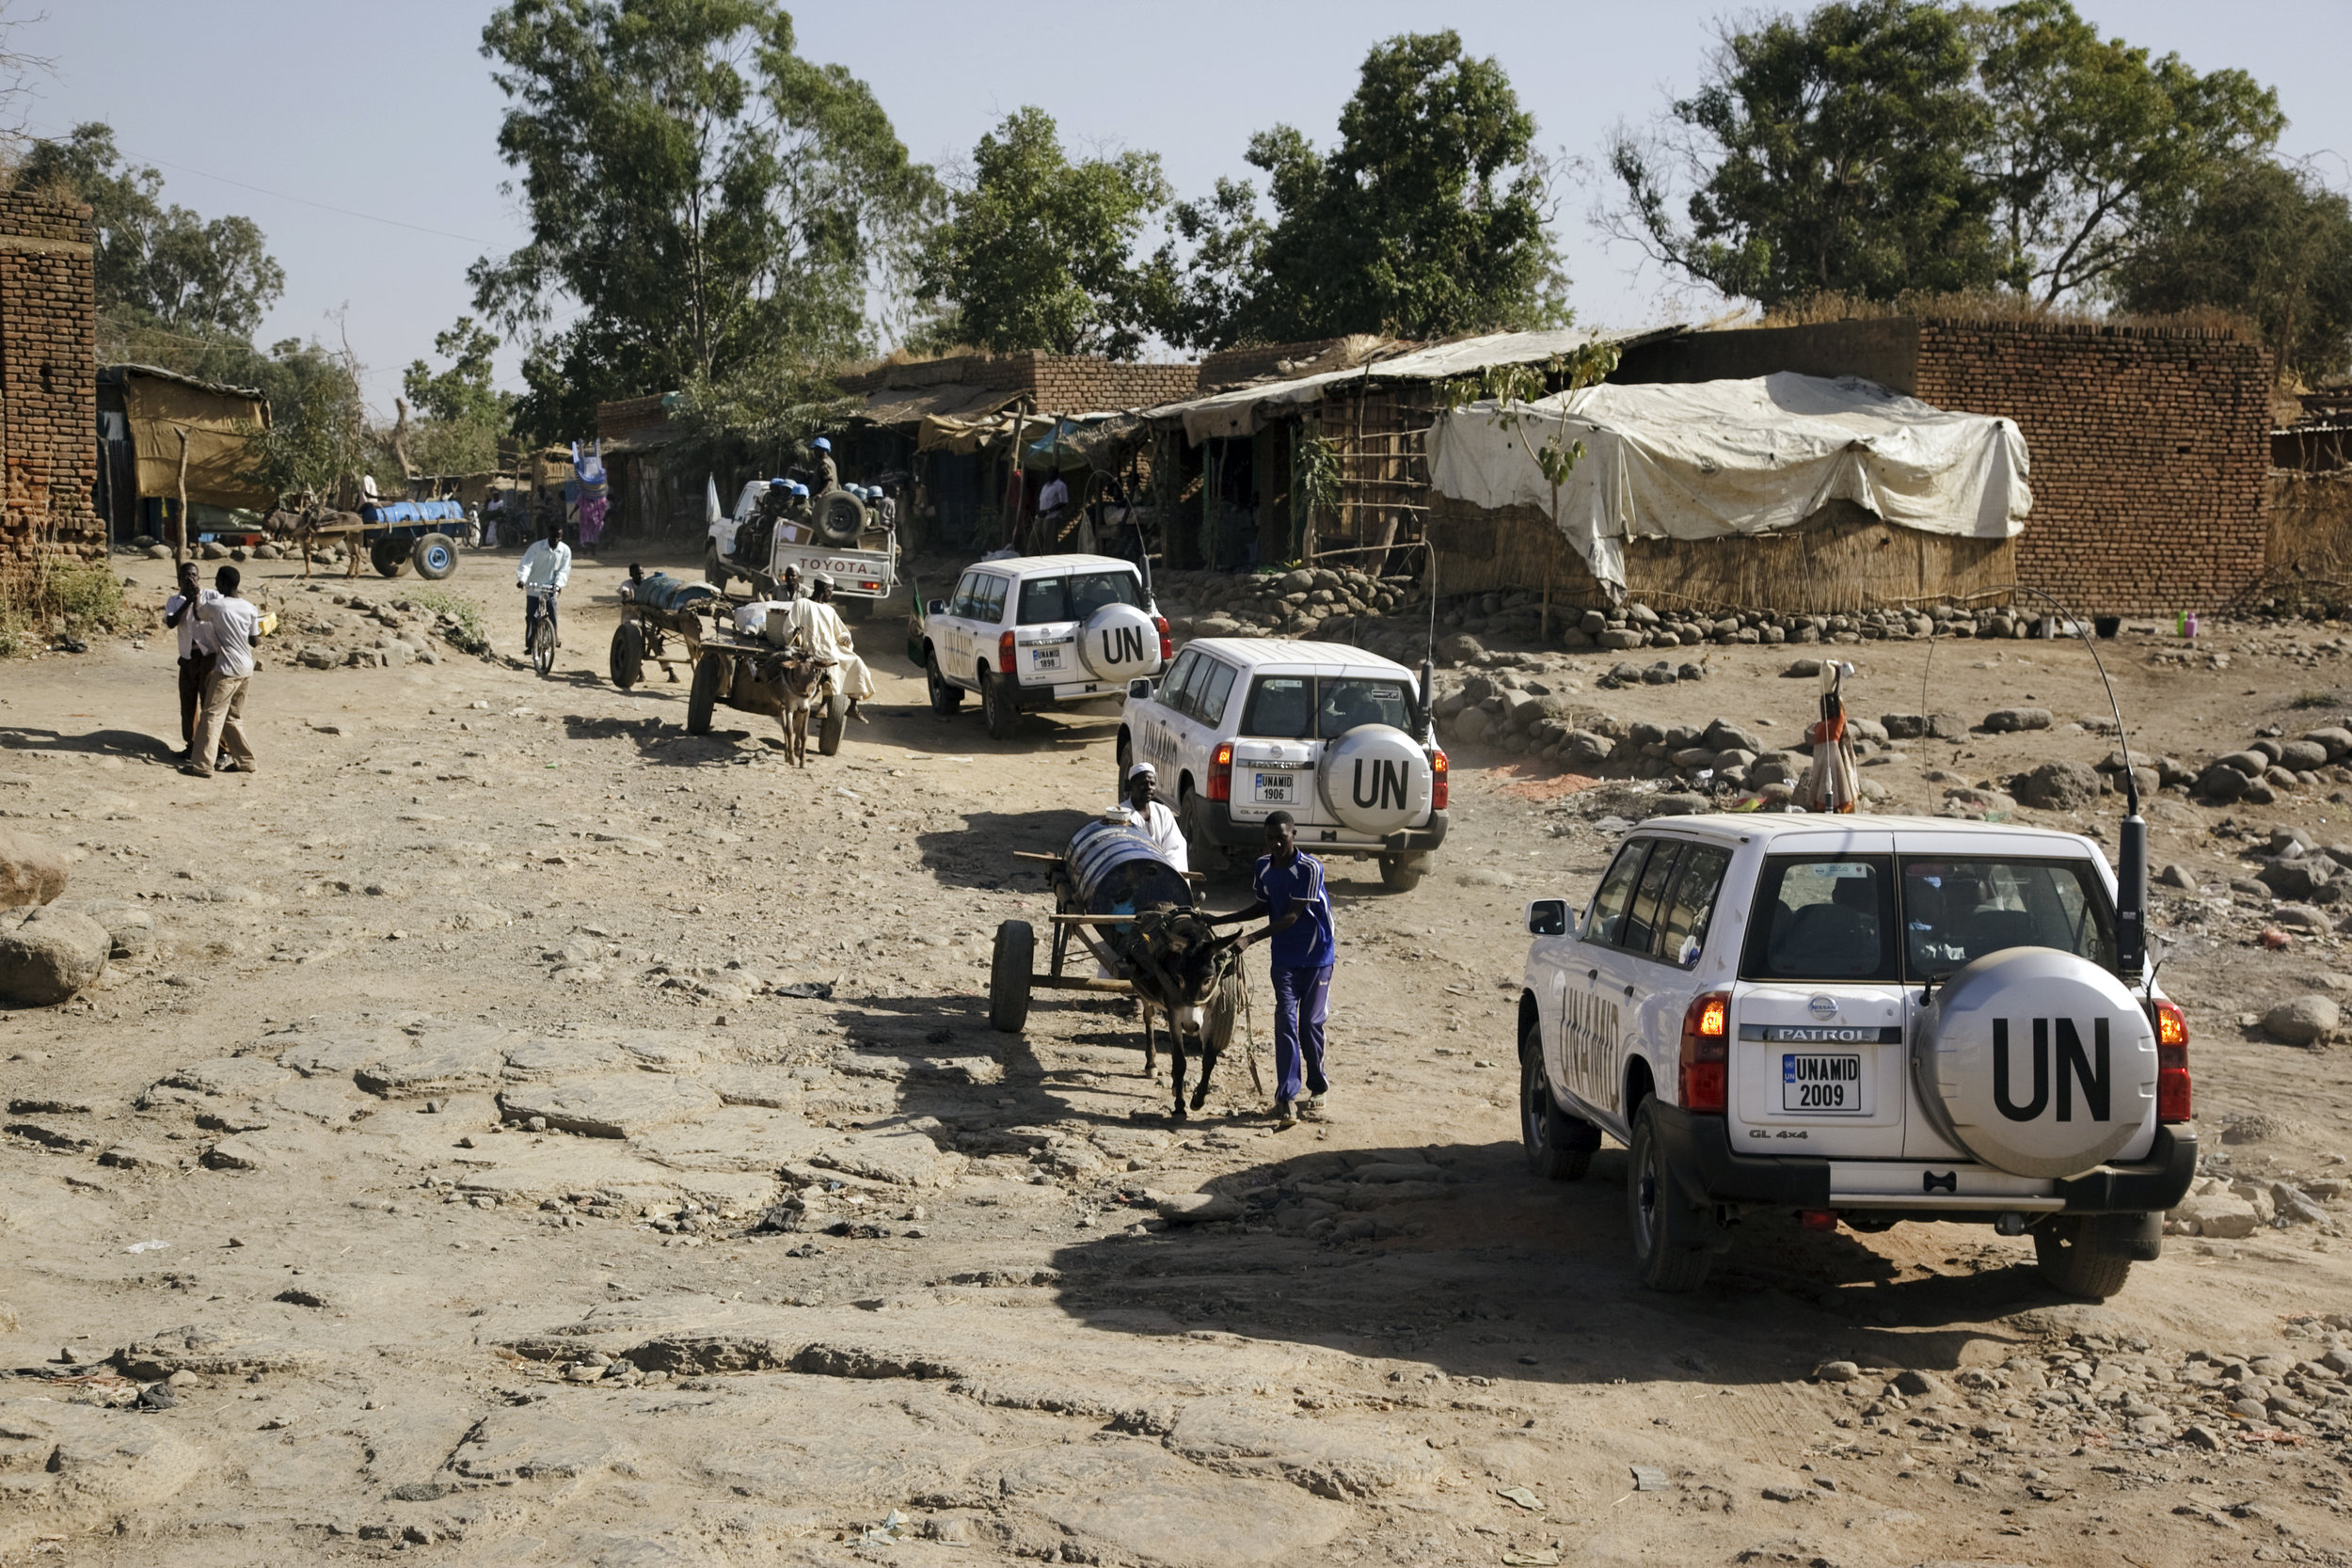 UN Mission in Darfur motorcade travels through a village. 14 February 2010 I Sudan  © UN Photo/Albert González Farran